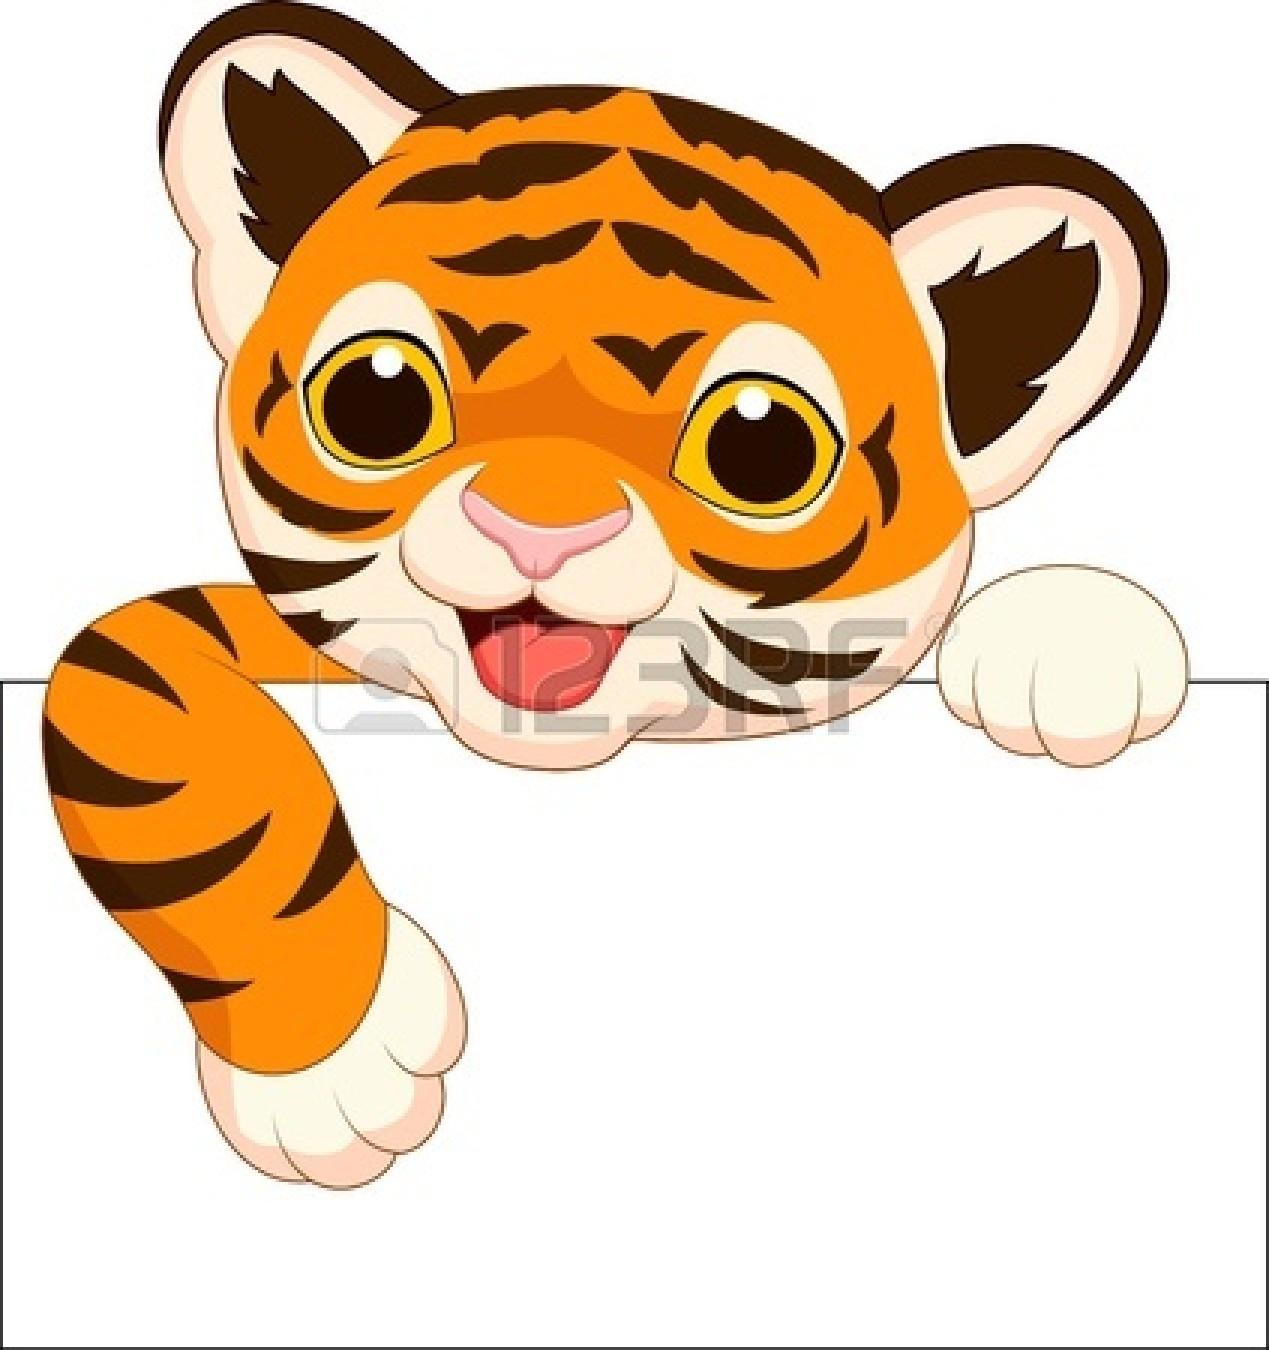 1269x1350 Cartoon Baby Lion Face Image Shy Cute Cartoon Lion Royalty Free